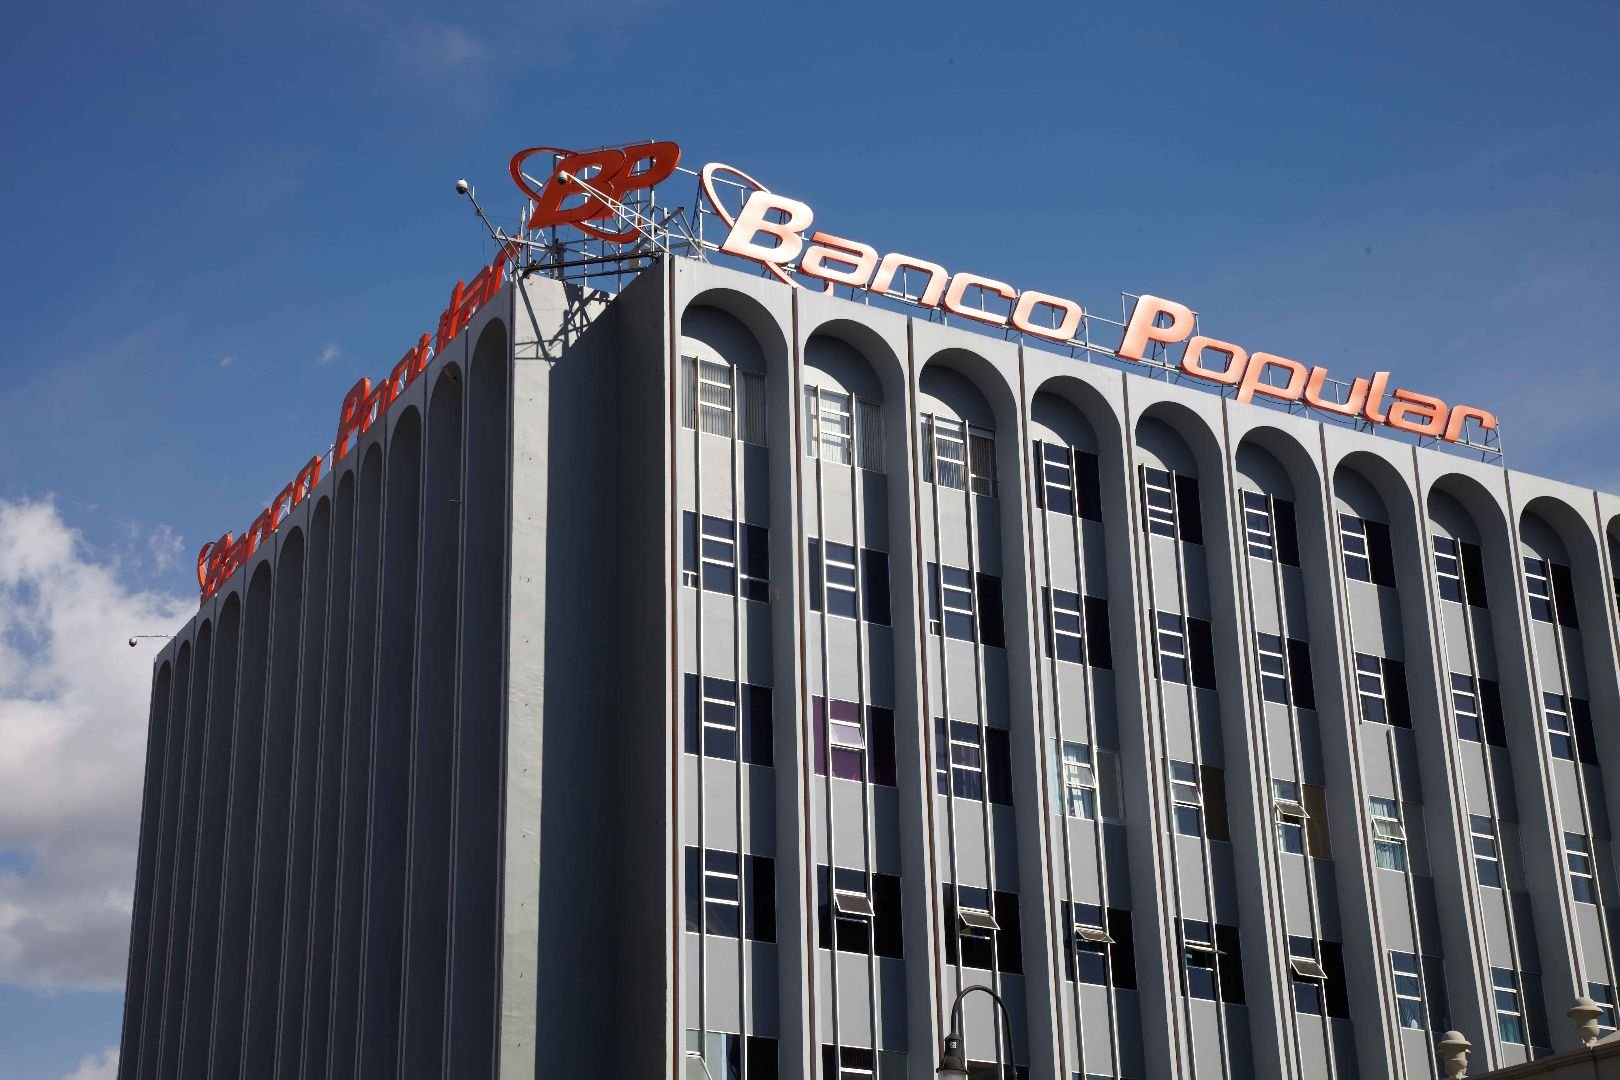 Banco popular de costa rica horarios unicaja prestamos for Unicaja banco oficinas